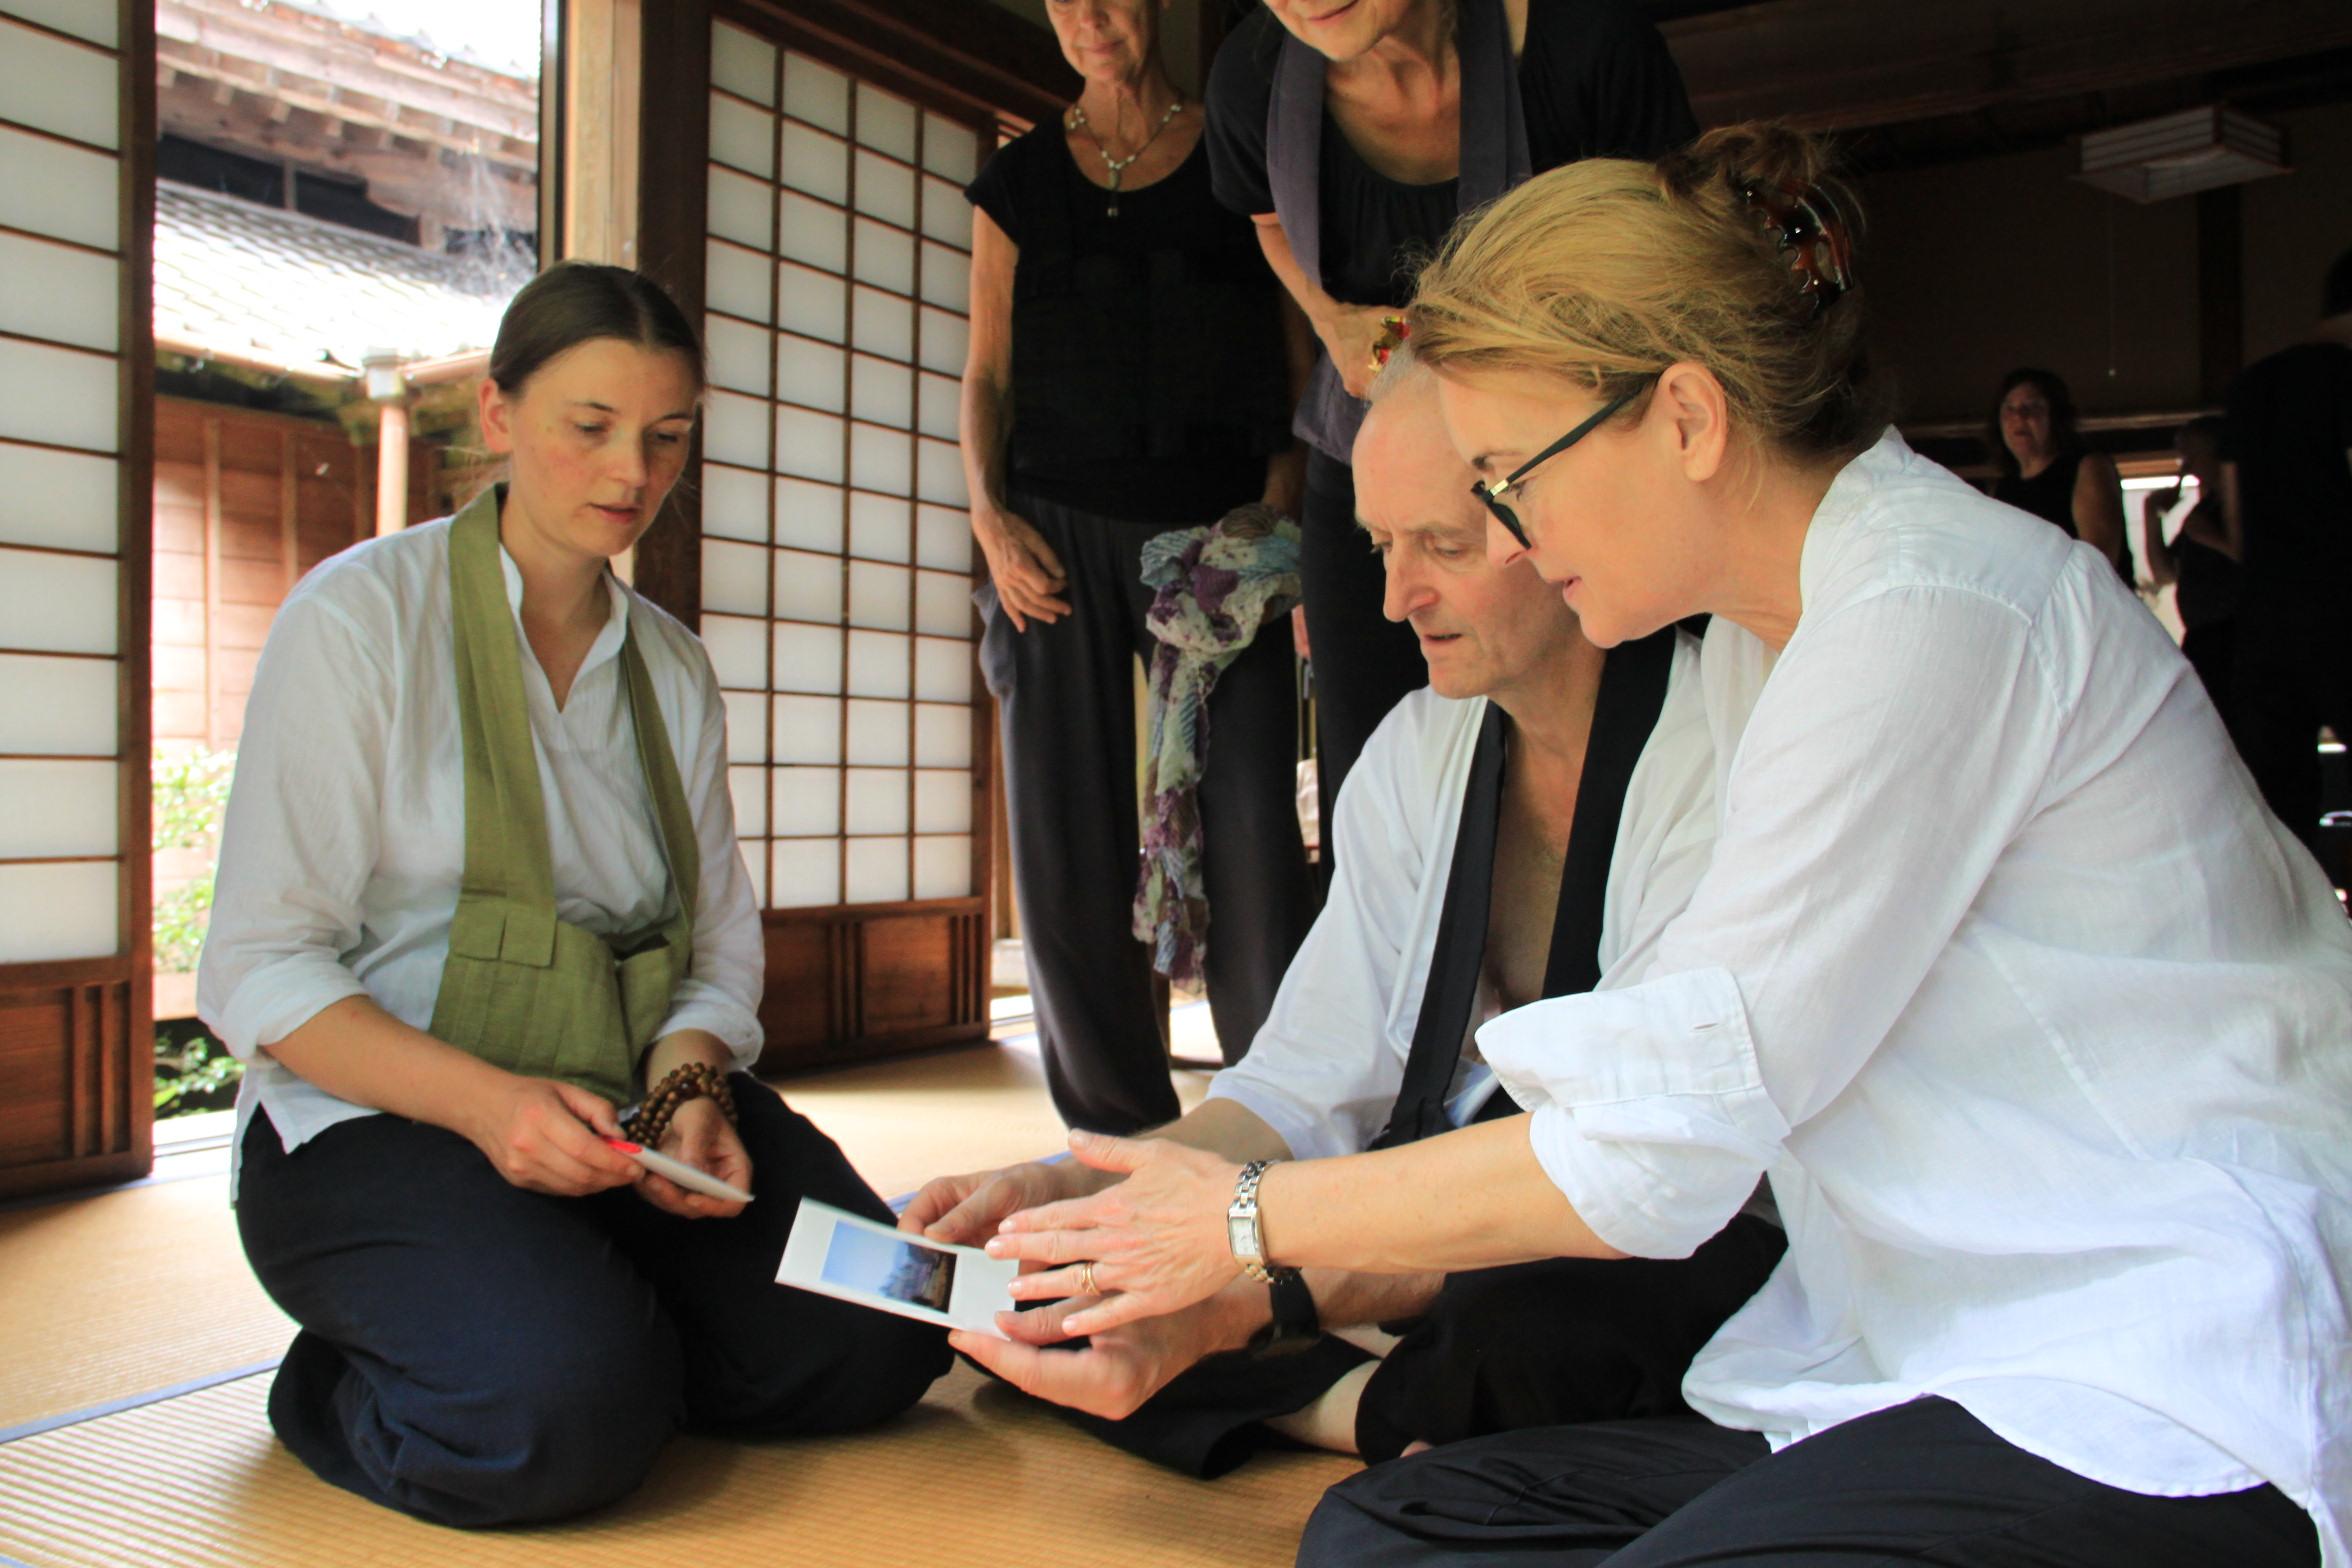 Japan Zen Reise Beate Aldag Ulrich Halstenbach Nicole Baden Roshi